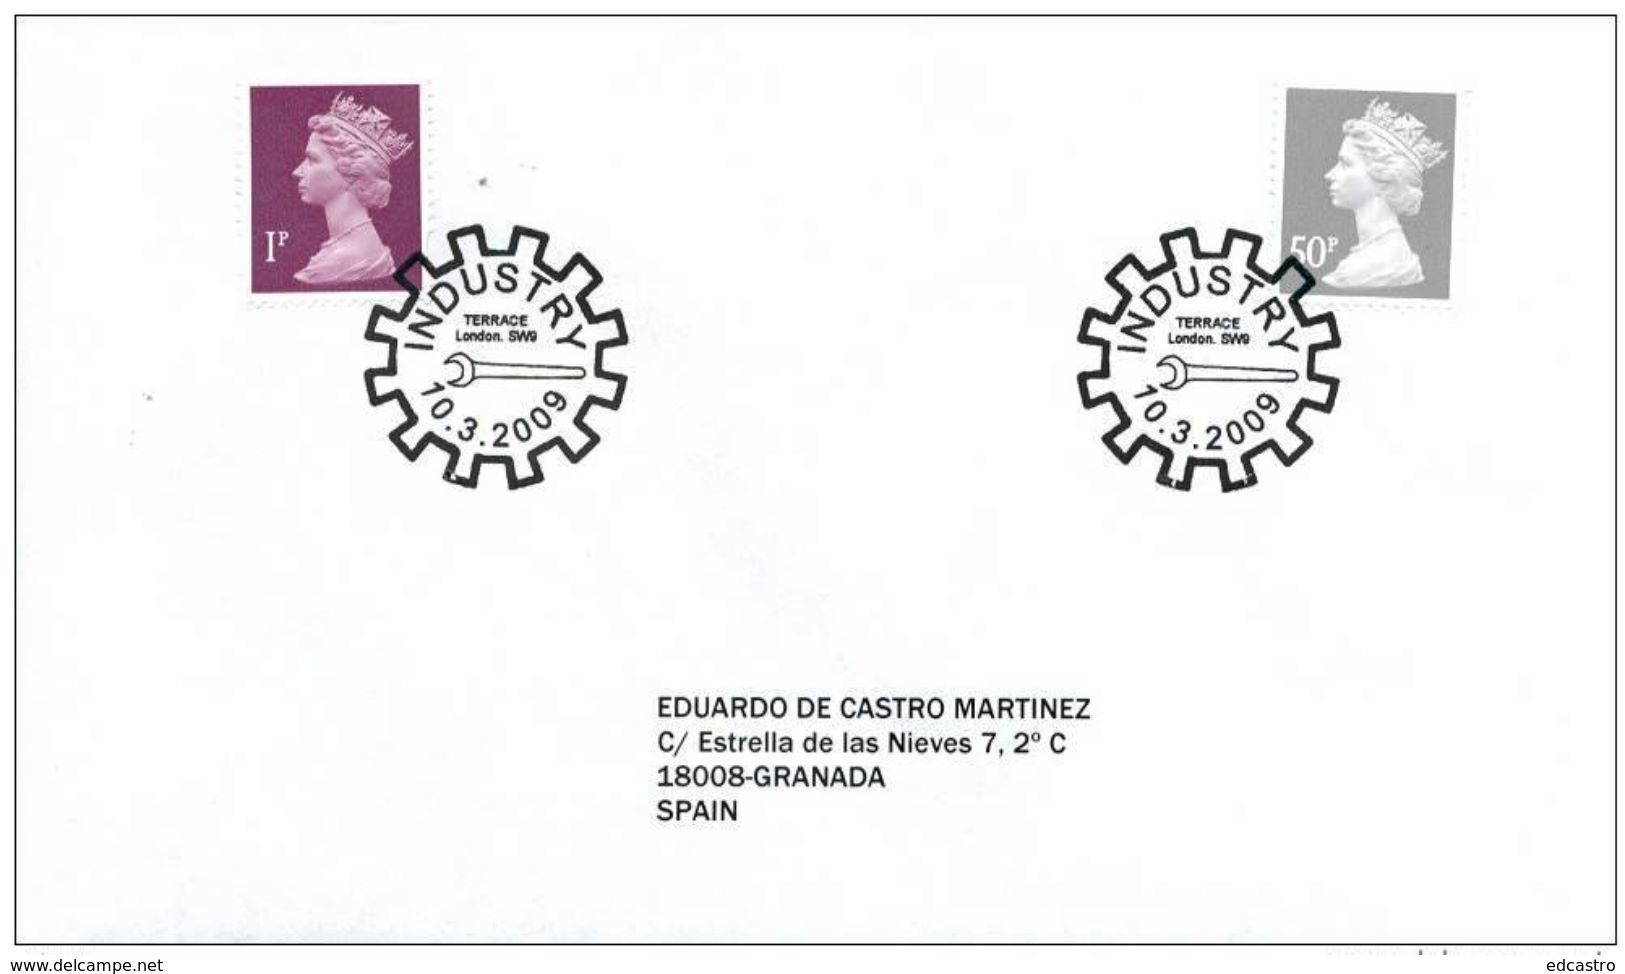 GREAT BRITAIN 2009. SPECIAL POSTMARK. PIONERS OF THE INDUSTRIAL REVOLUTION. TOOLS - Fábricas Y Industrias